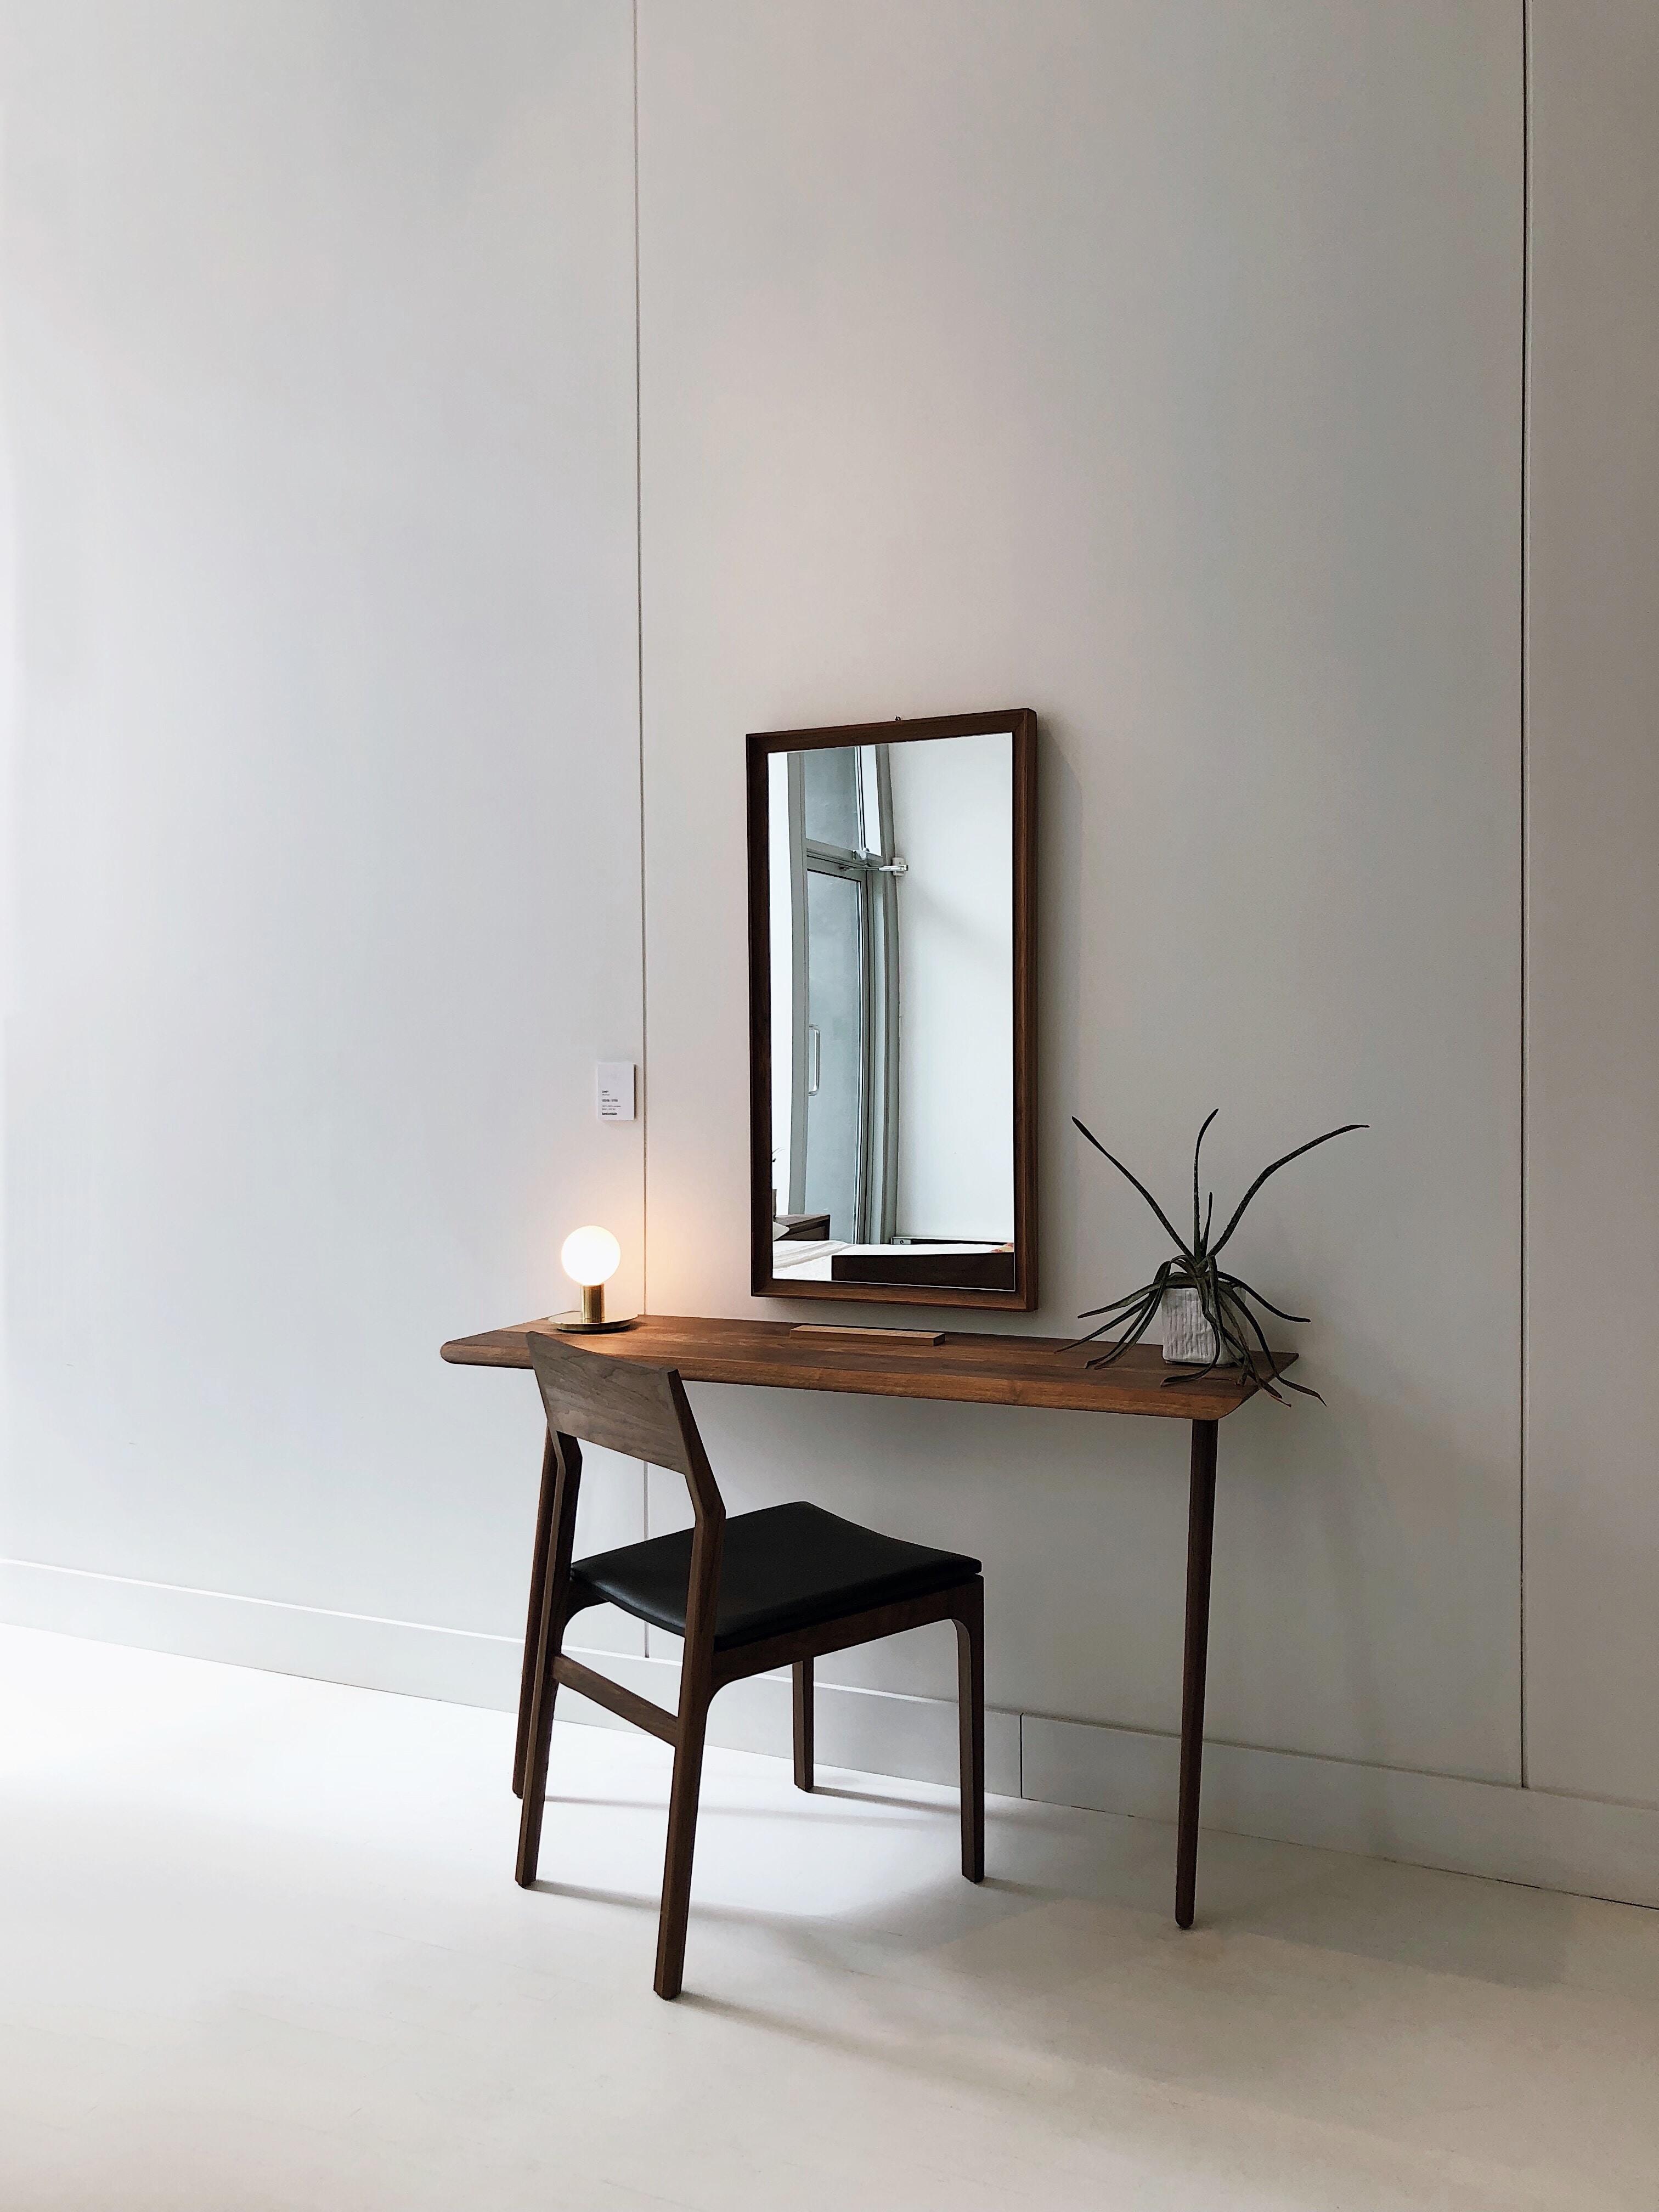 Cruel Mirror (a Haiku) reflection stories